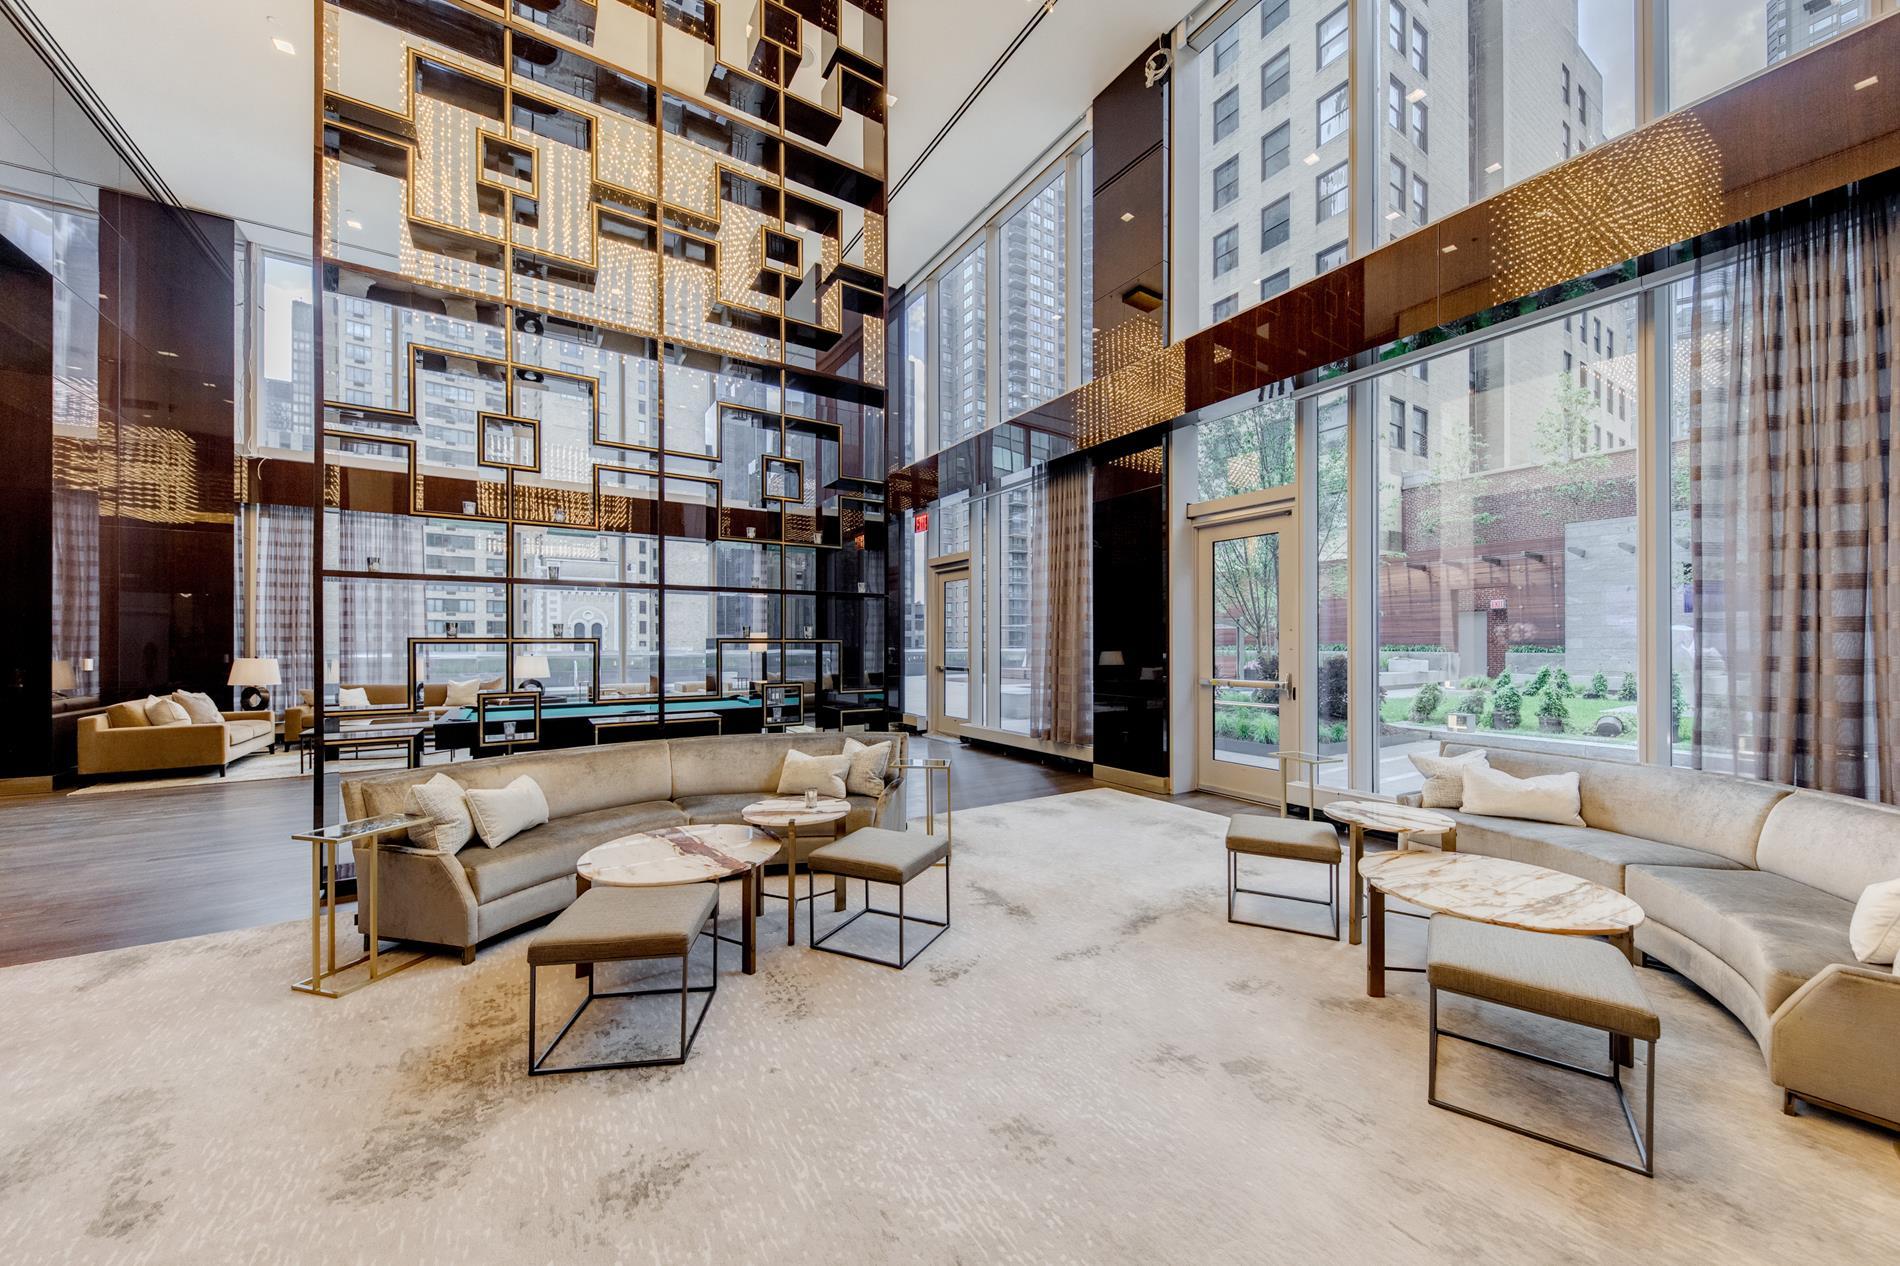 217 West 57th Street Interior Photo